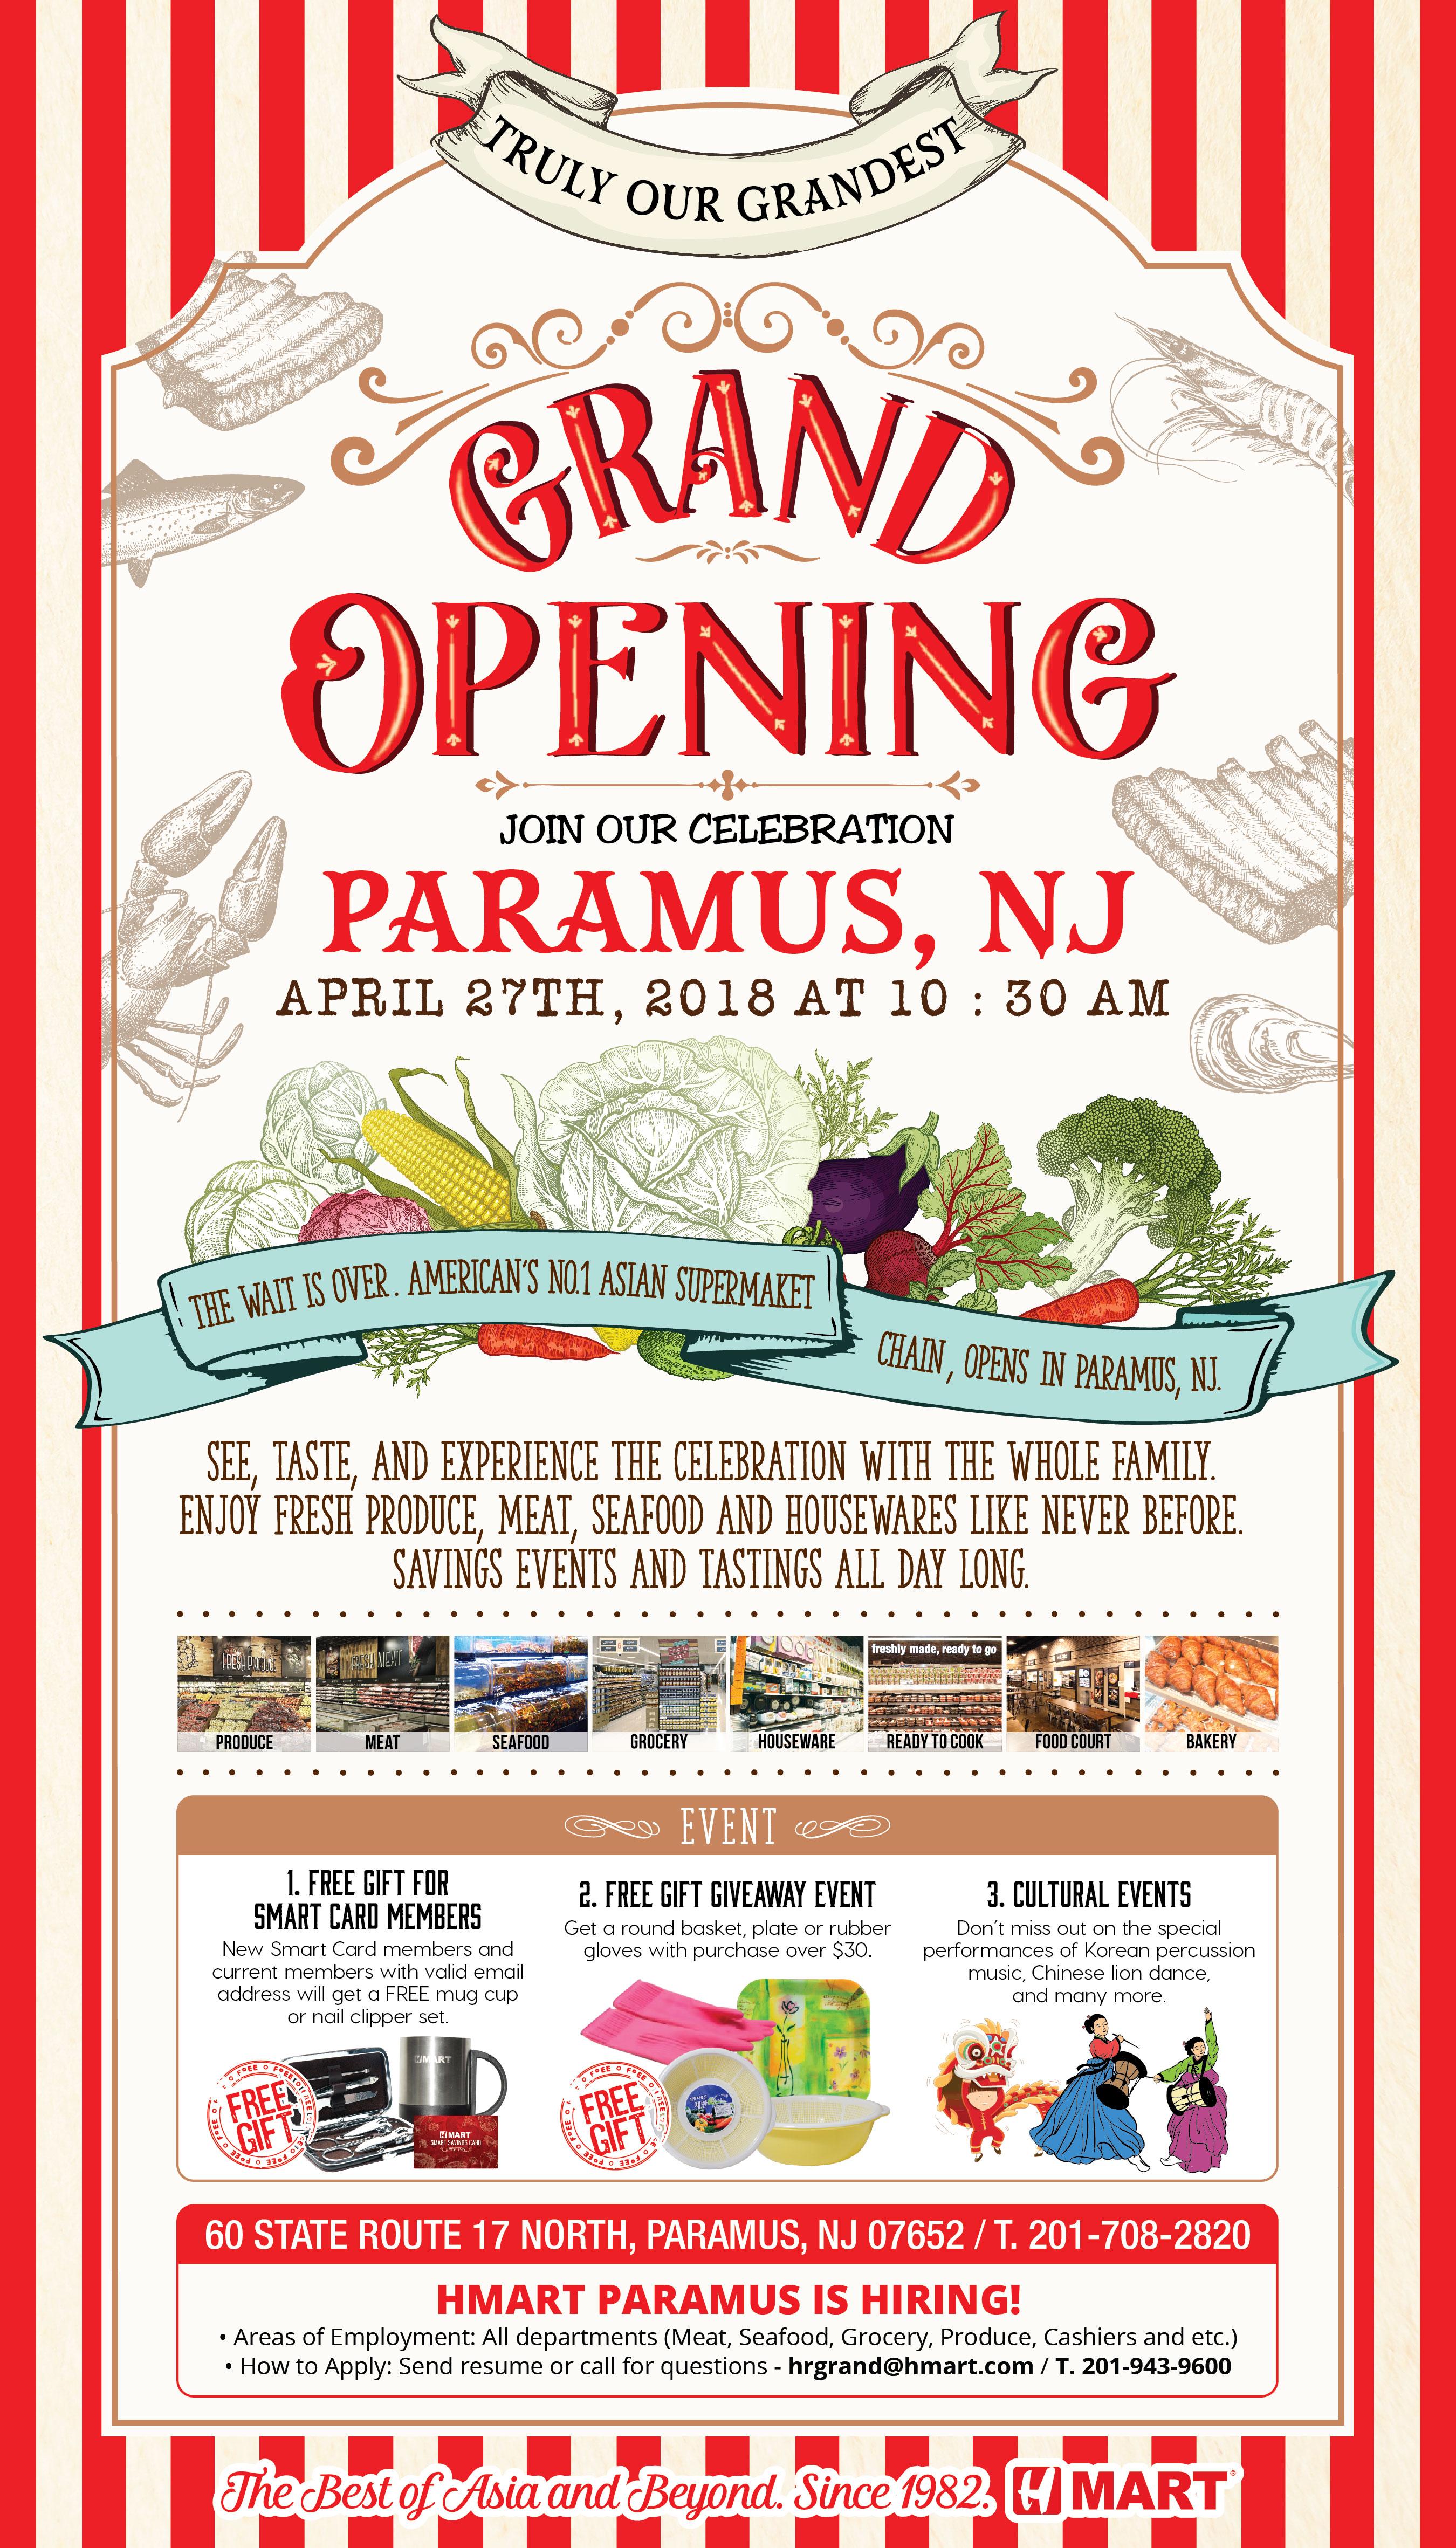 NJ_Paramus_Grand Opening_Poster_18x31_5-01